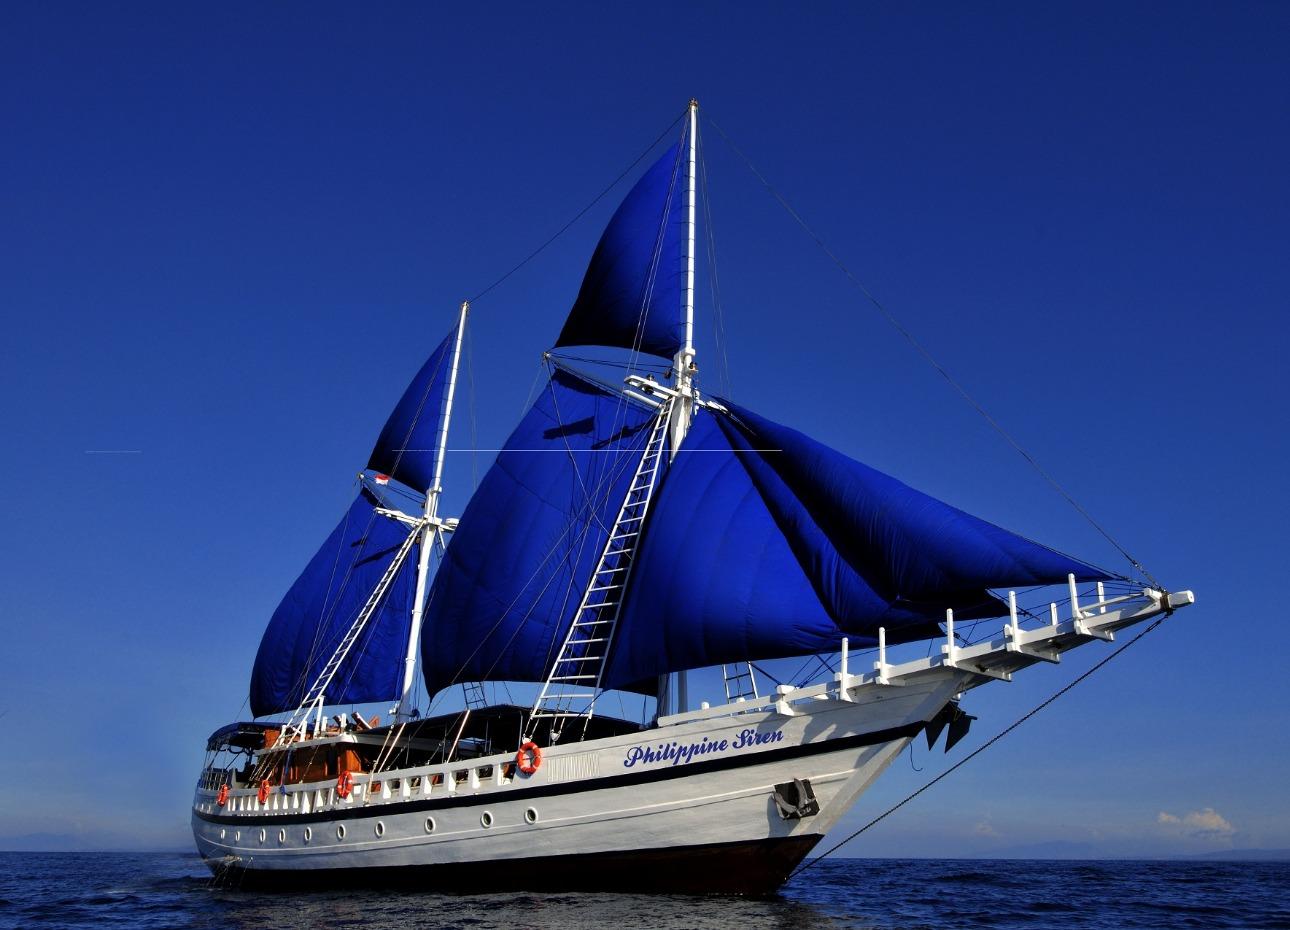 Philippines Siren, image,